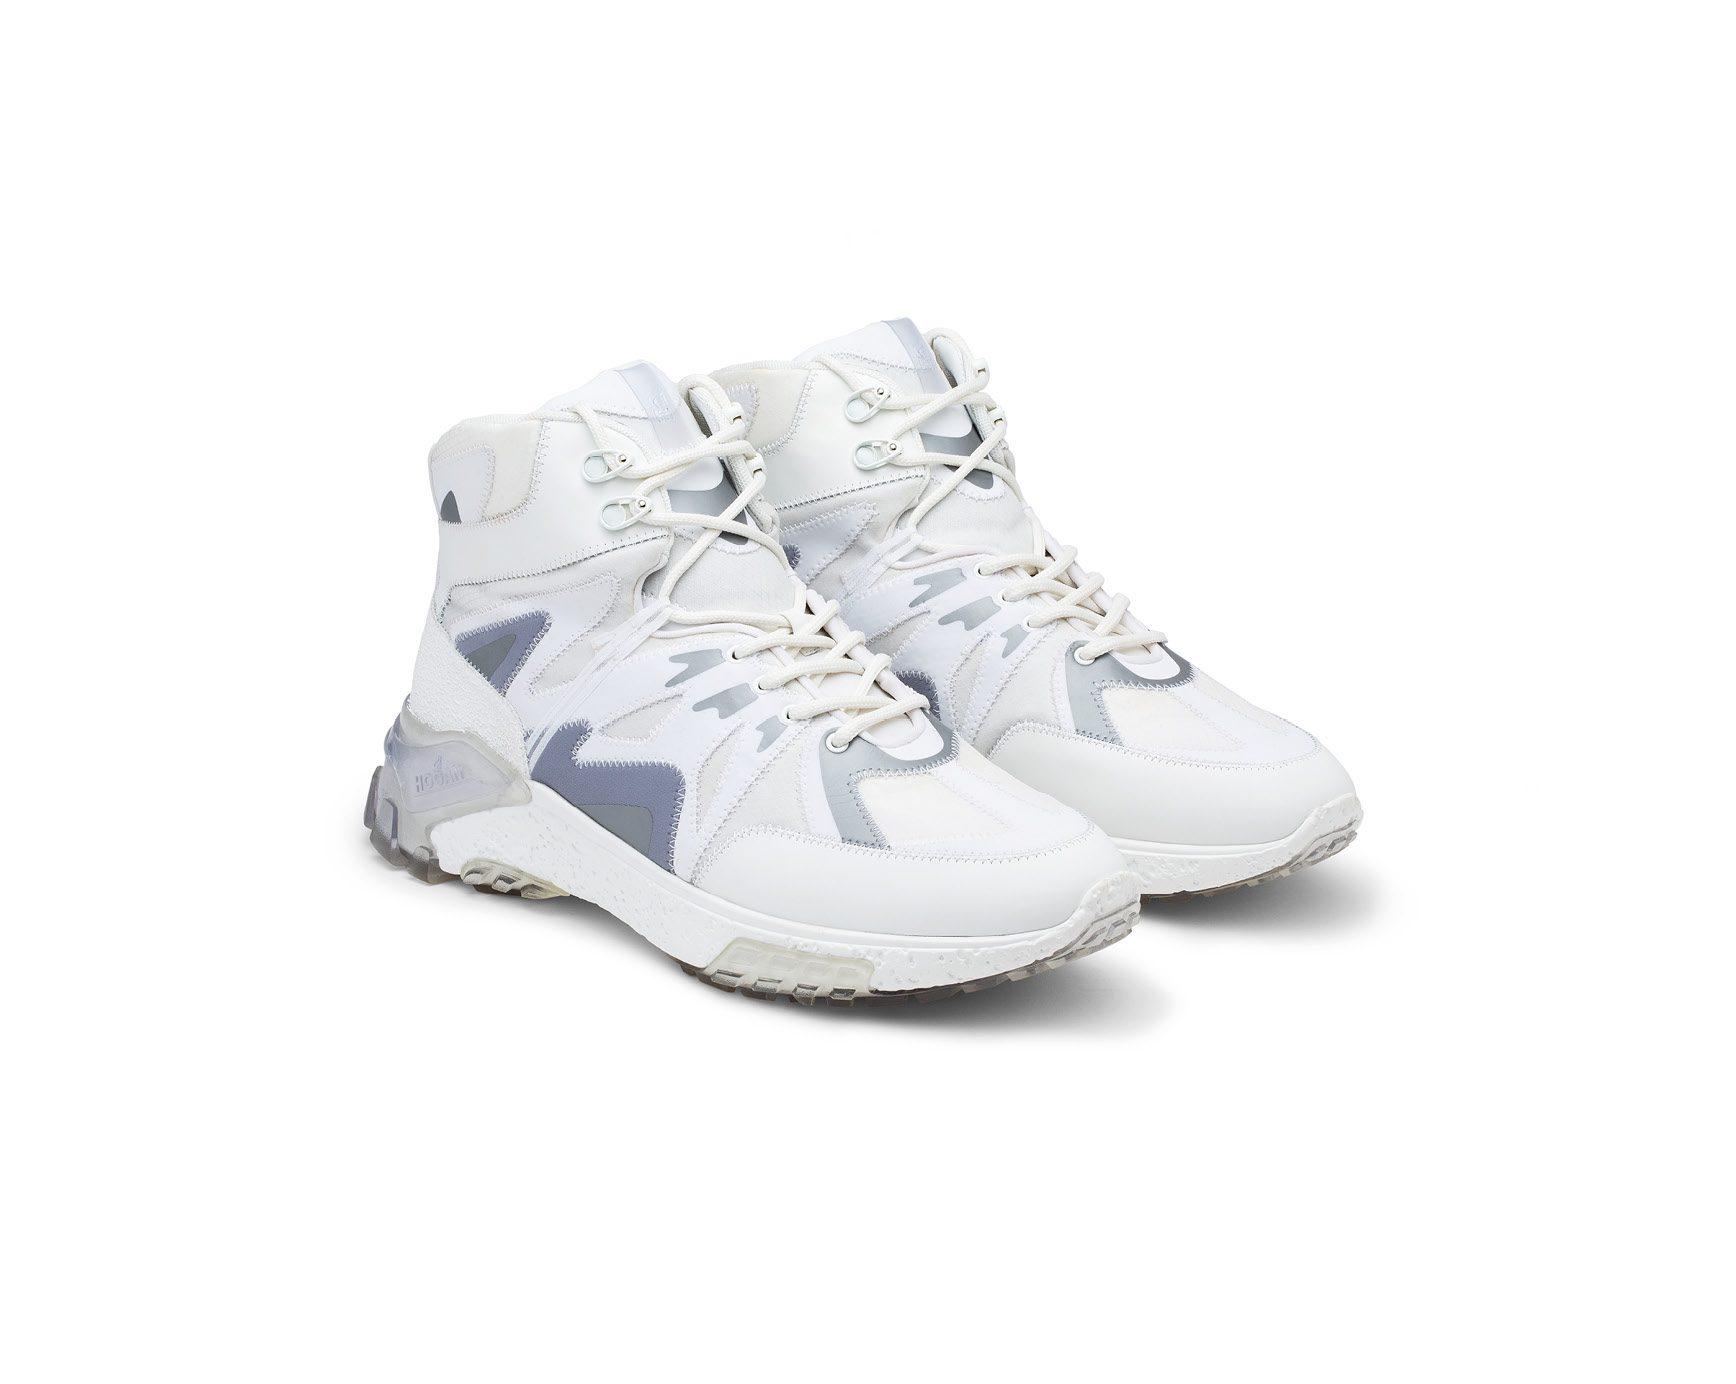 tenis hogan winter 2020 bulky shoes